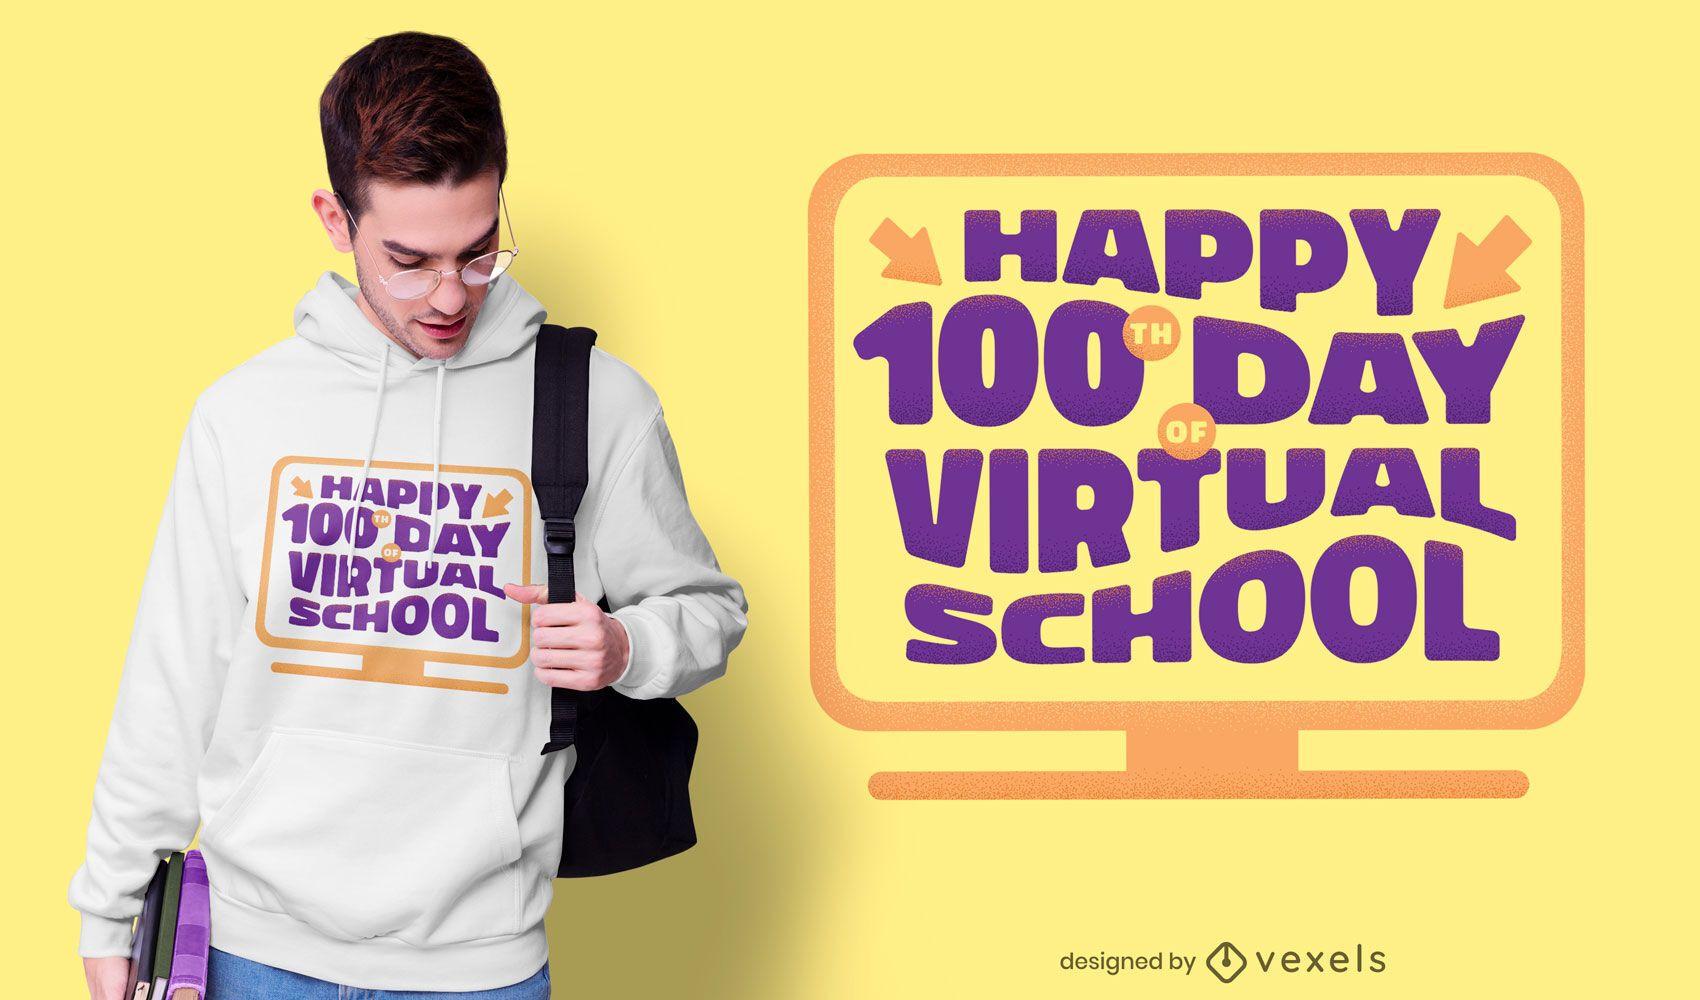 Virtual school t-shirt design